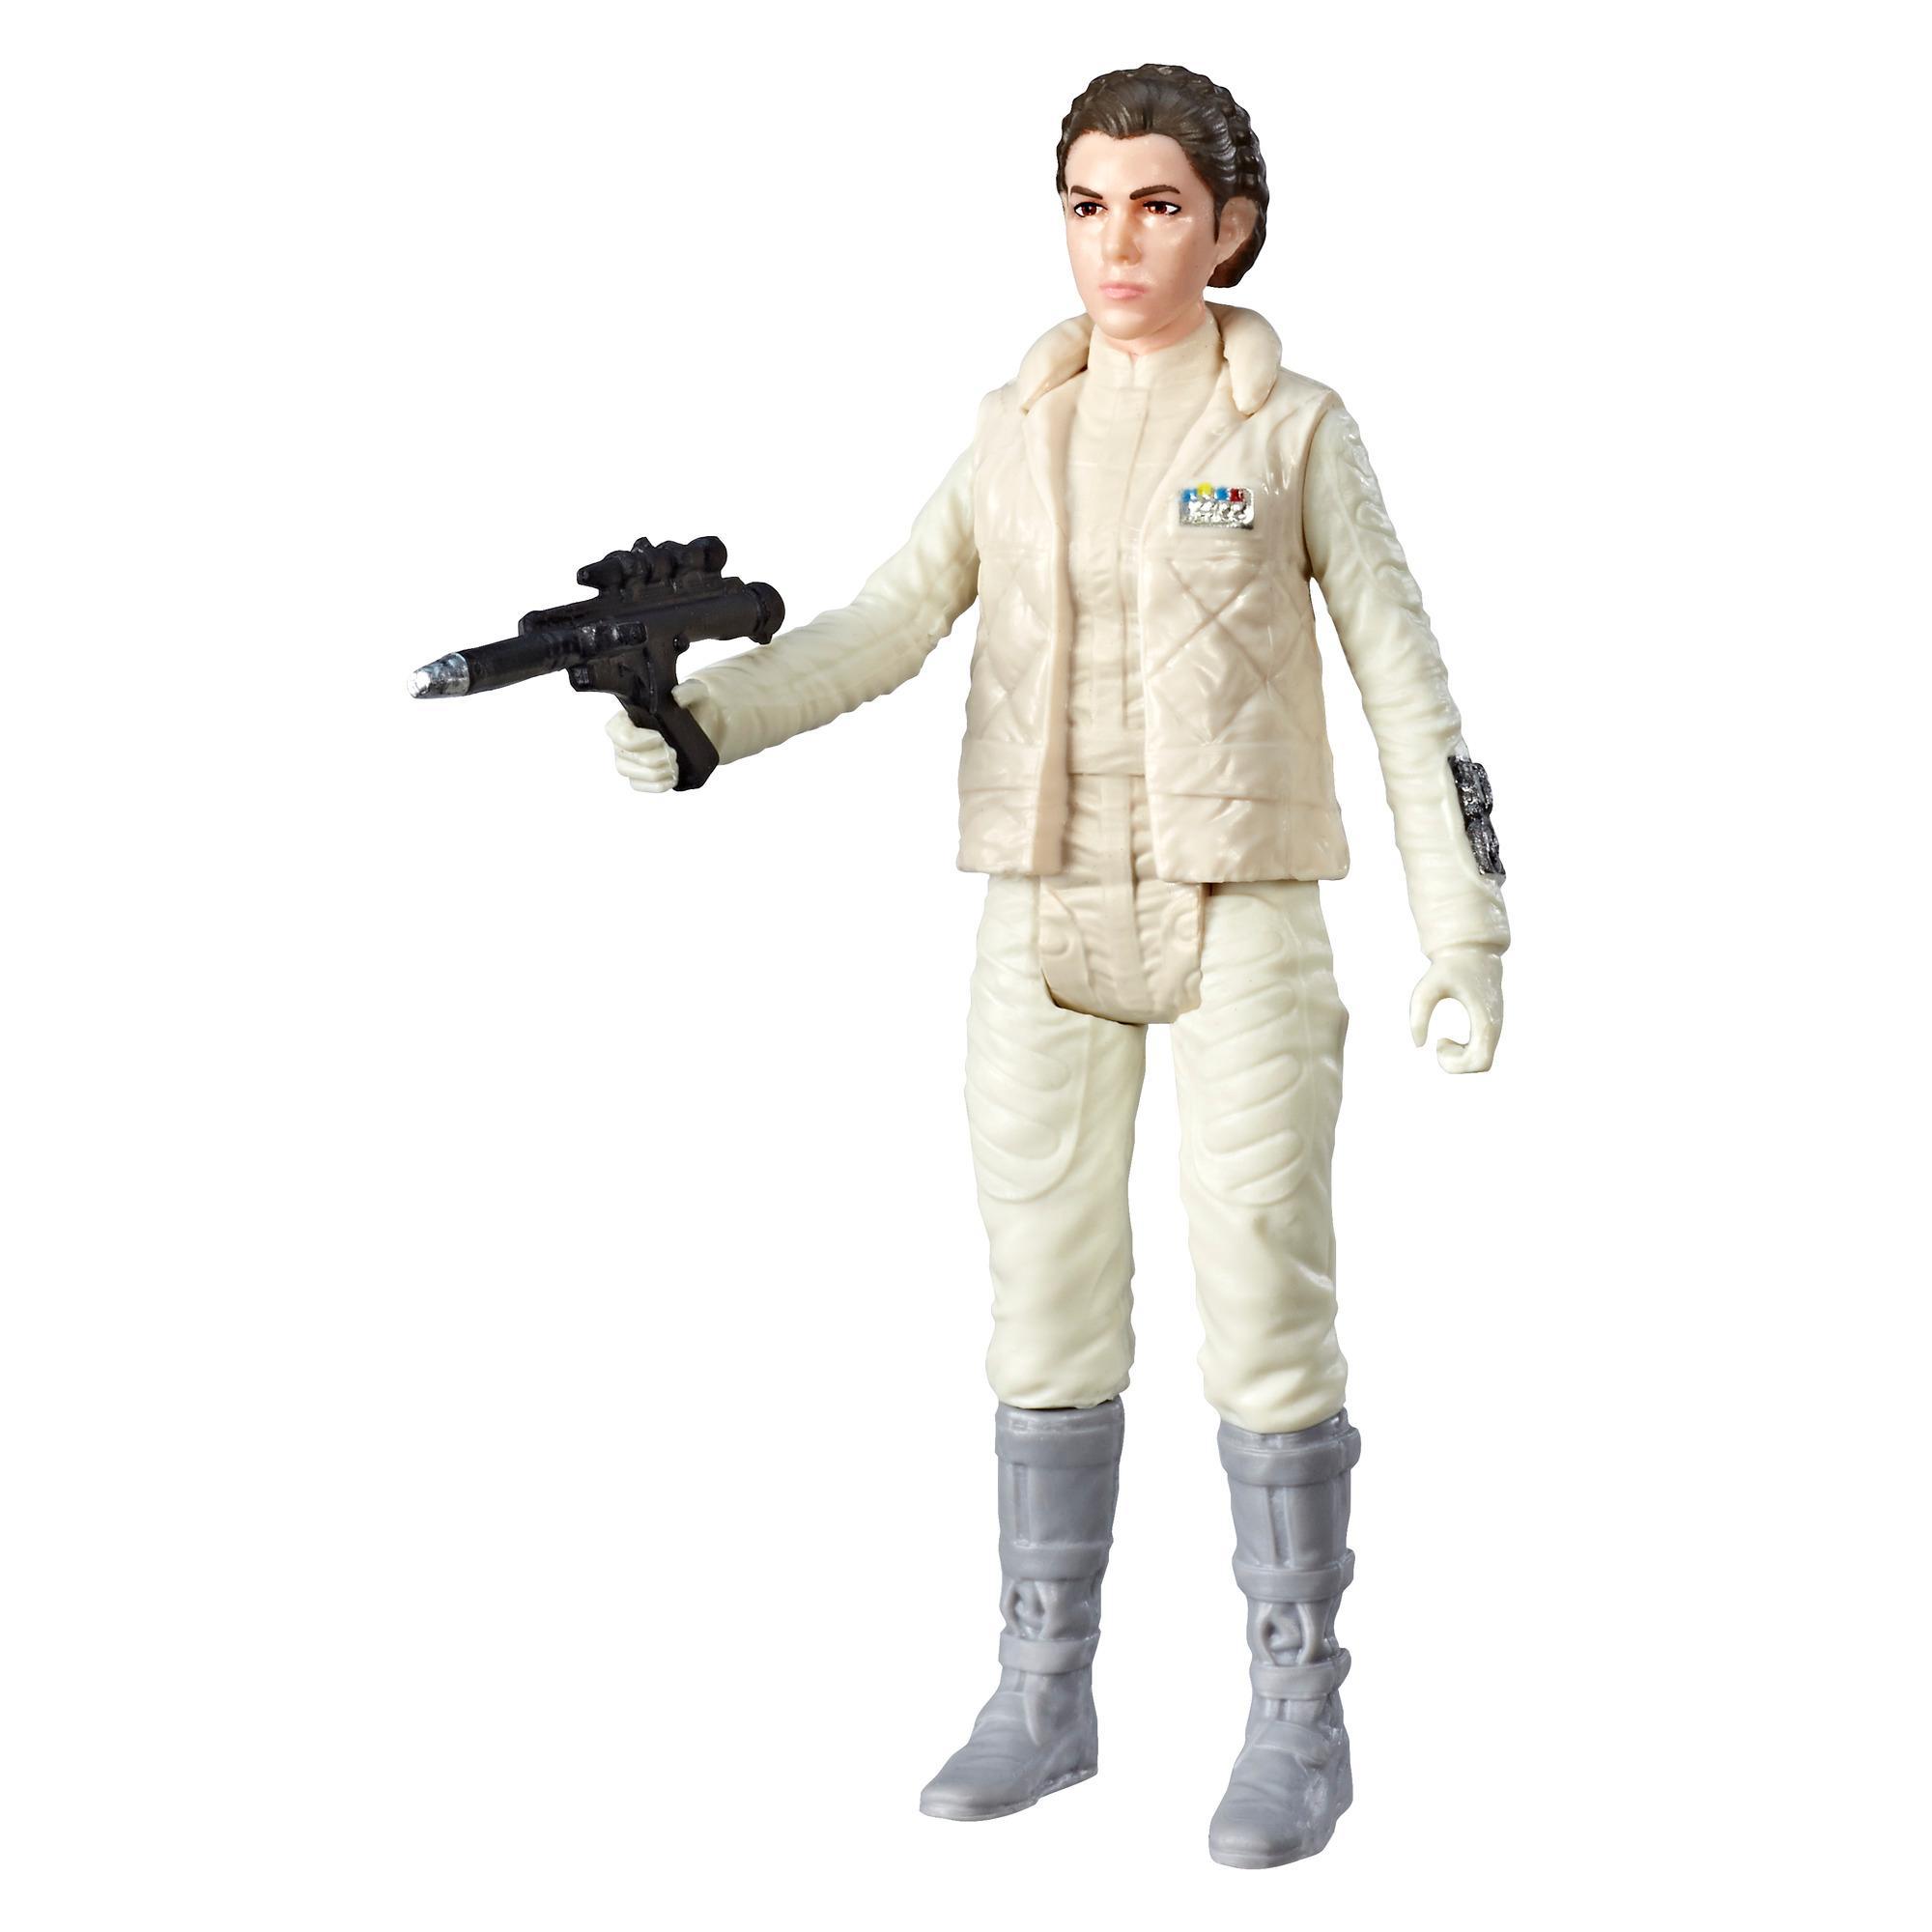 Star Wars Galaxy of Adventures Princess Leia Figure and Mini Comic